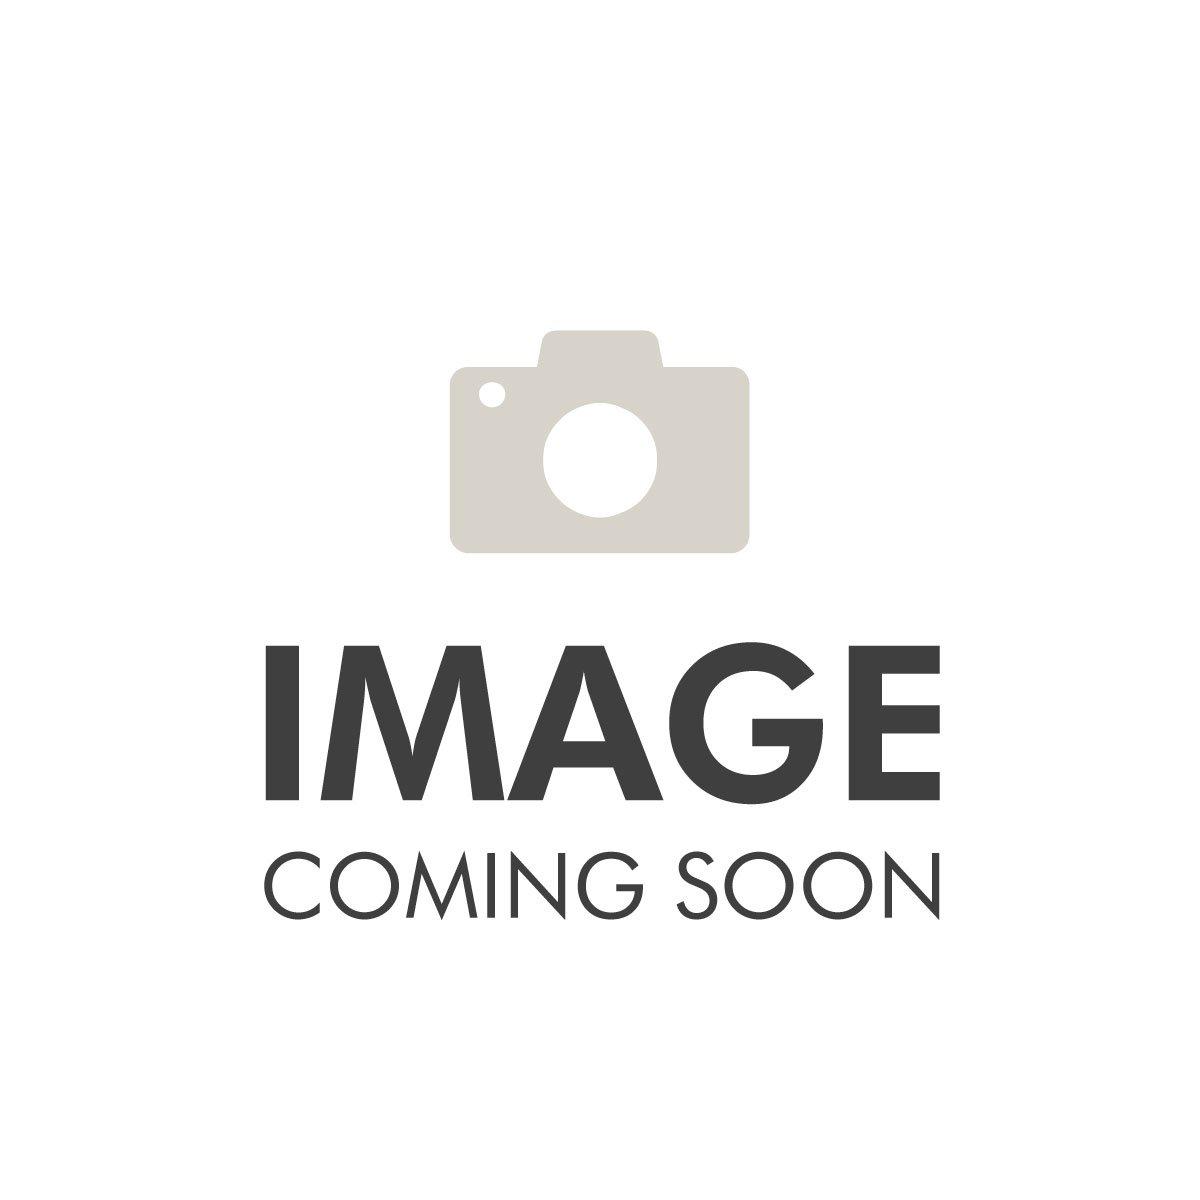 Clarins Ombre Iridescente Cream-to-Powder Eyeshadow 7g - 06 Silver Green